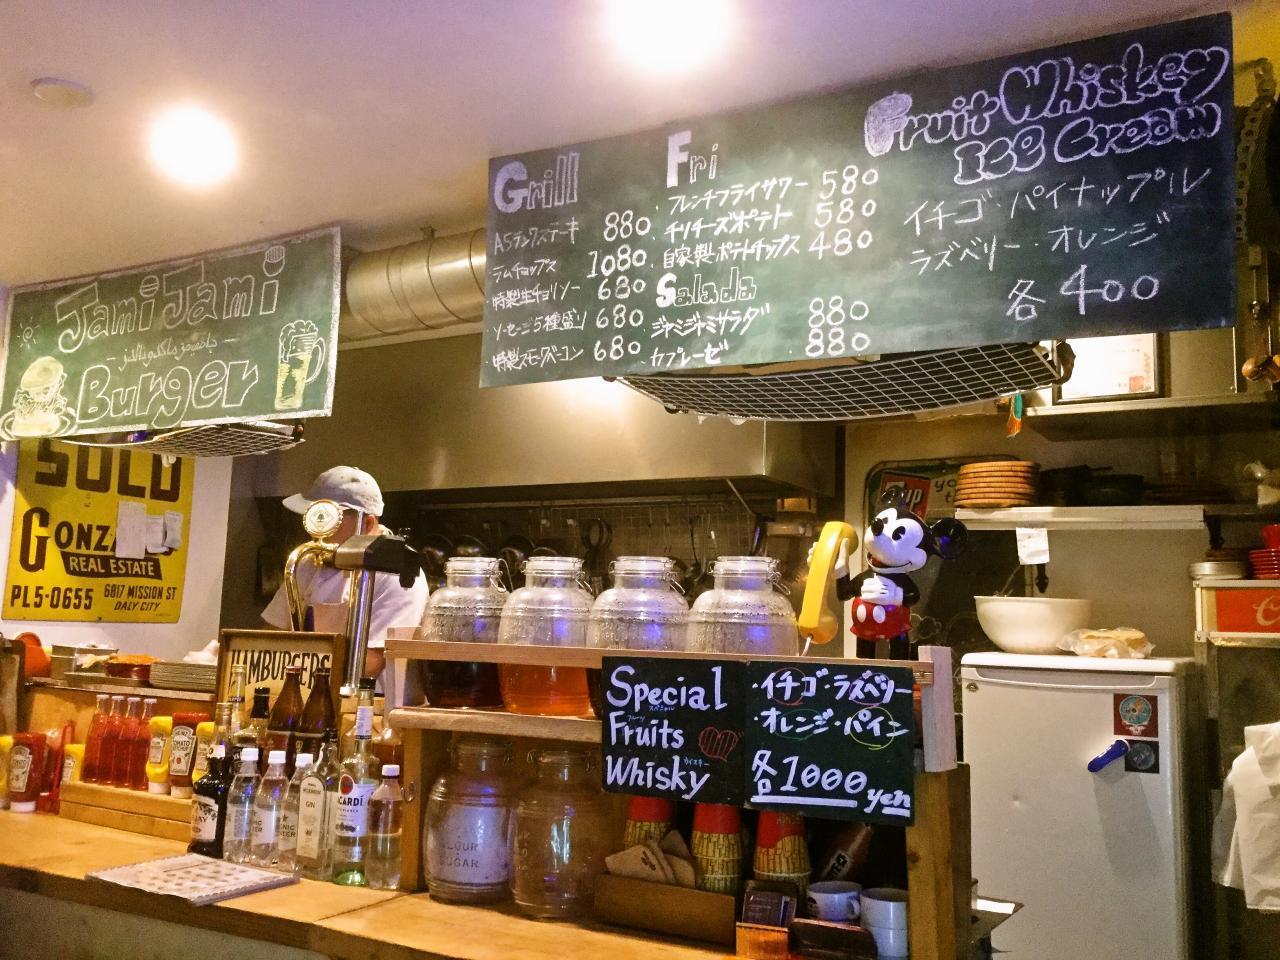 Jami Jami Burger 森野店(店内)